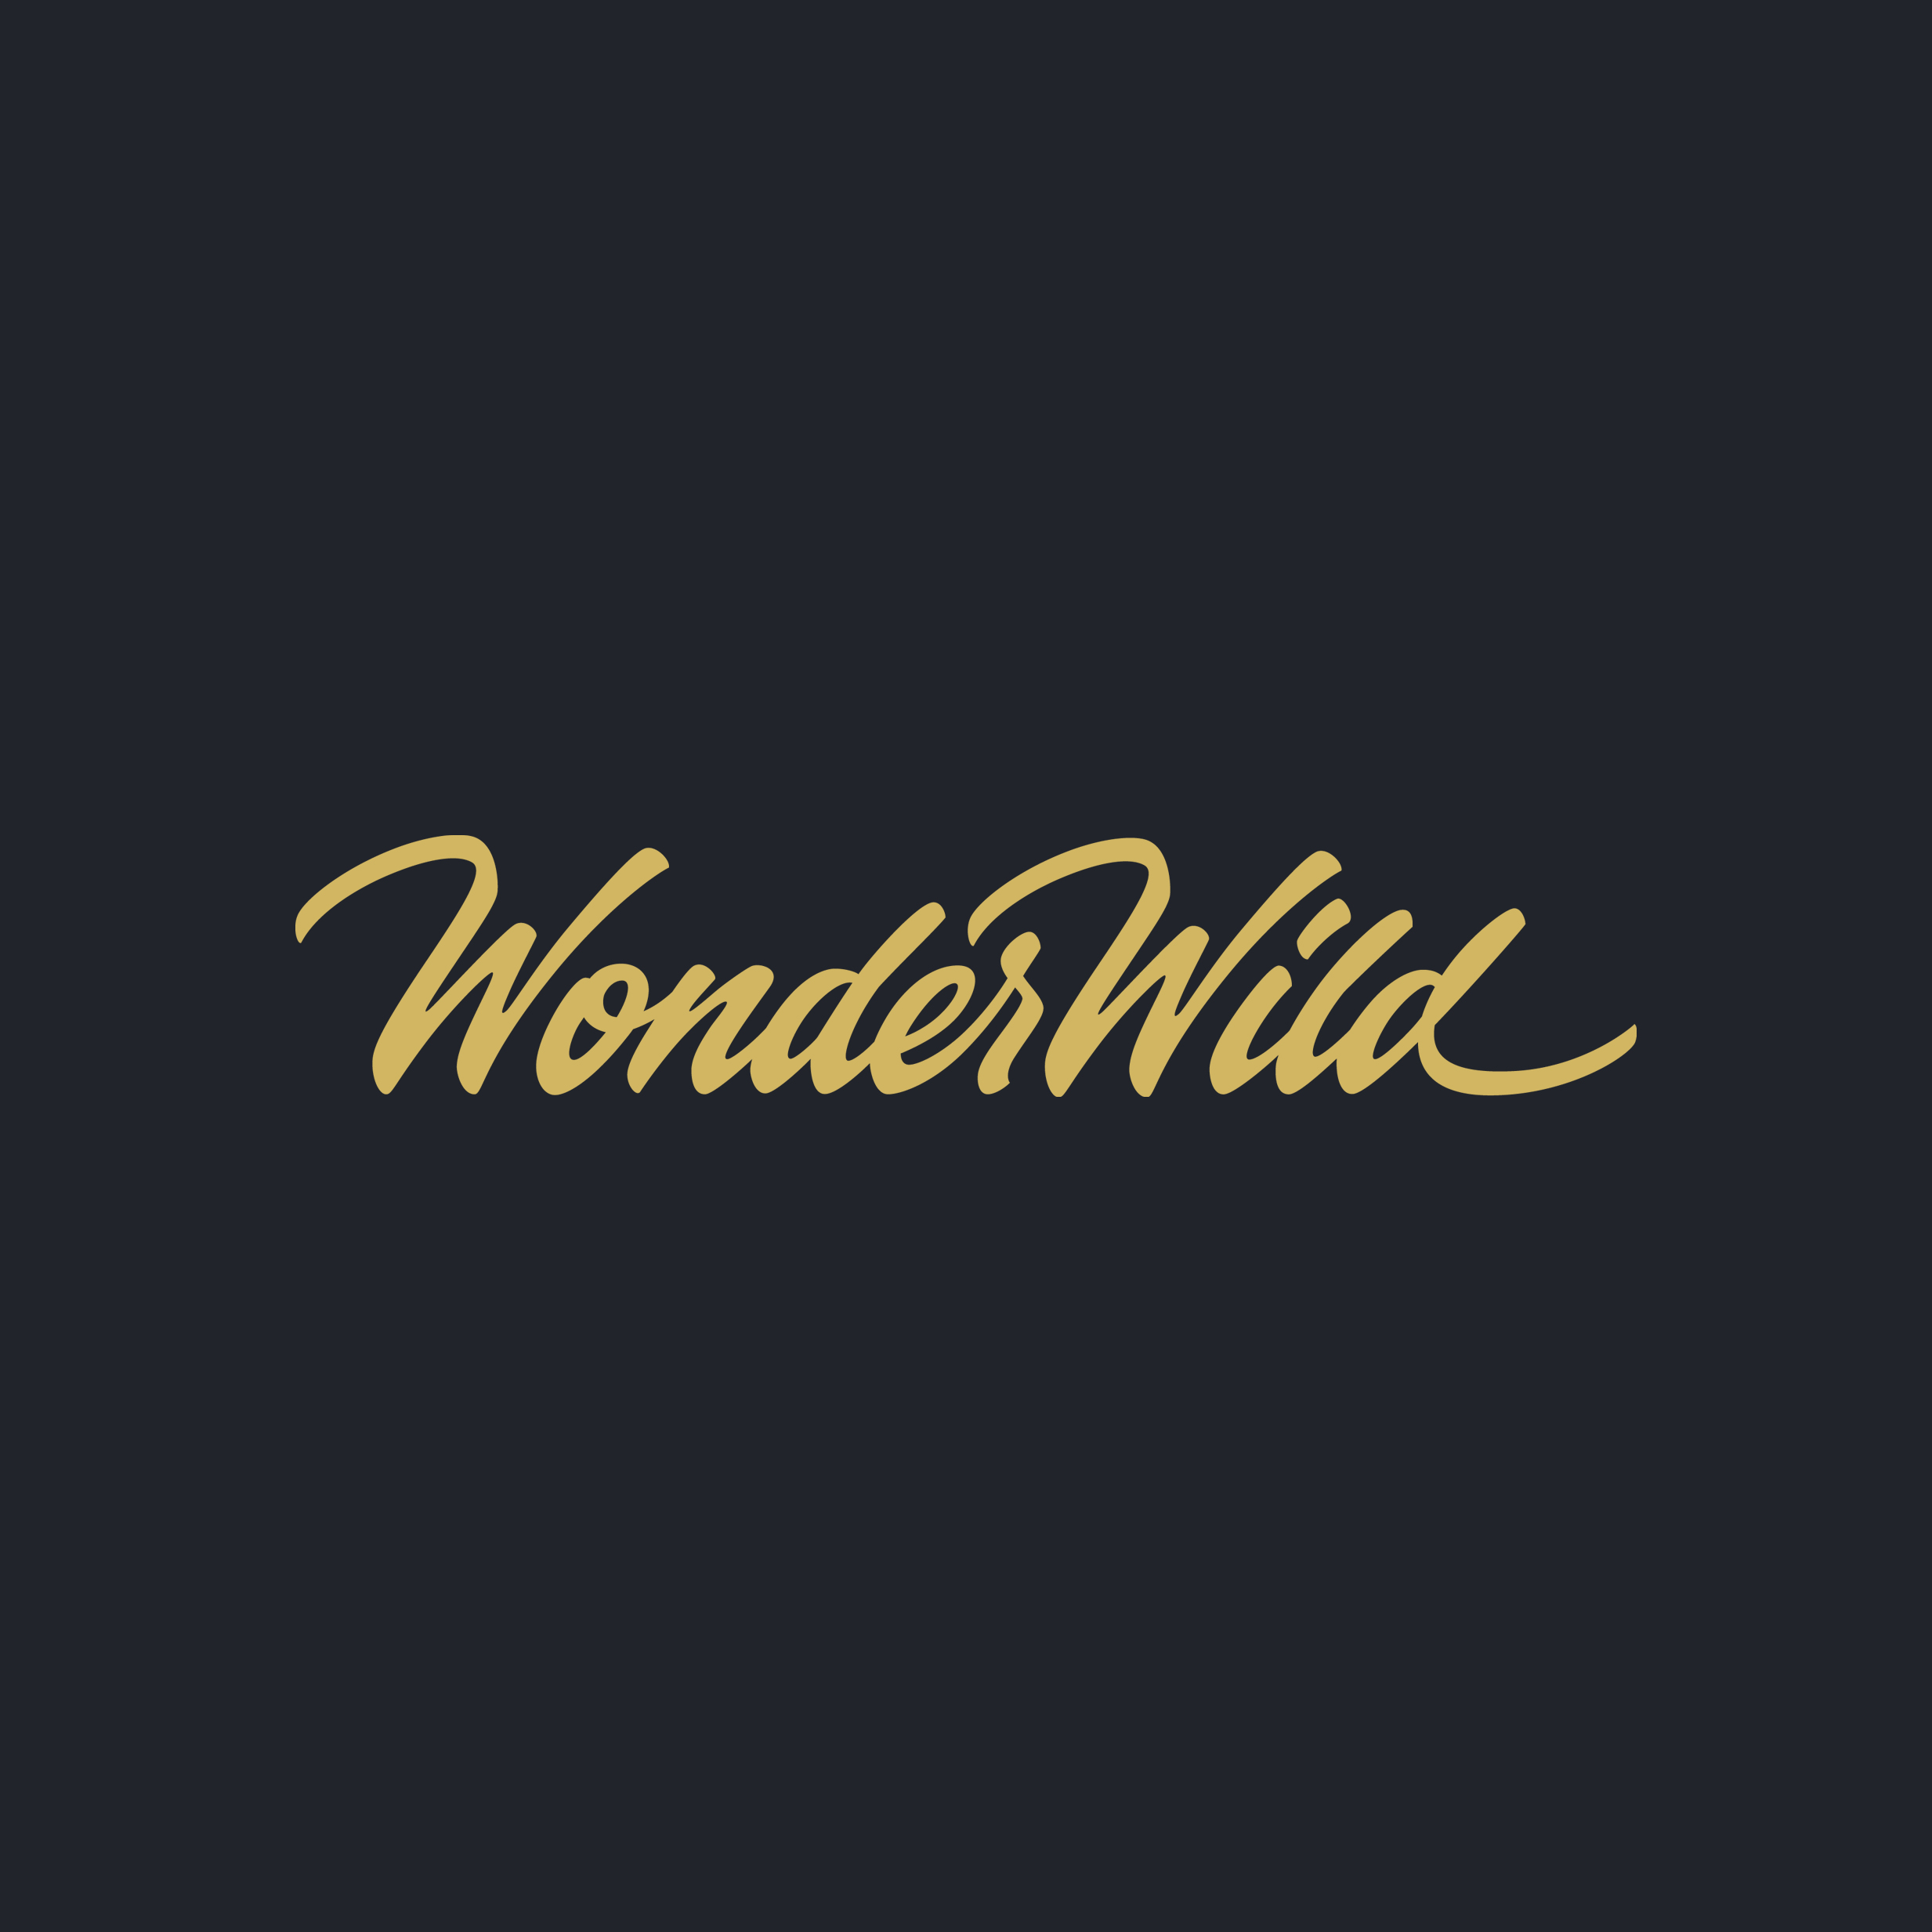 WonderWild Logo